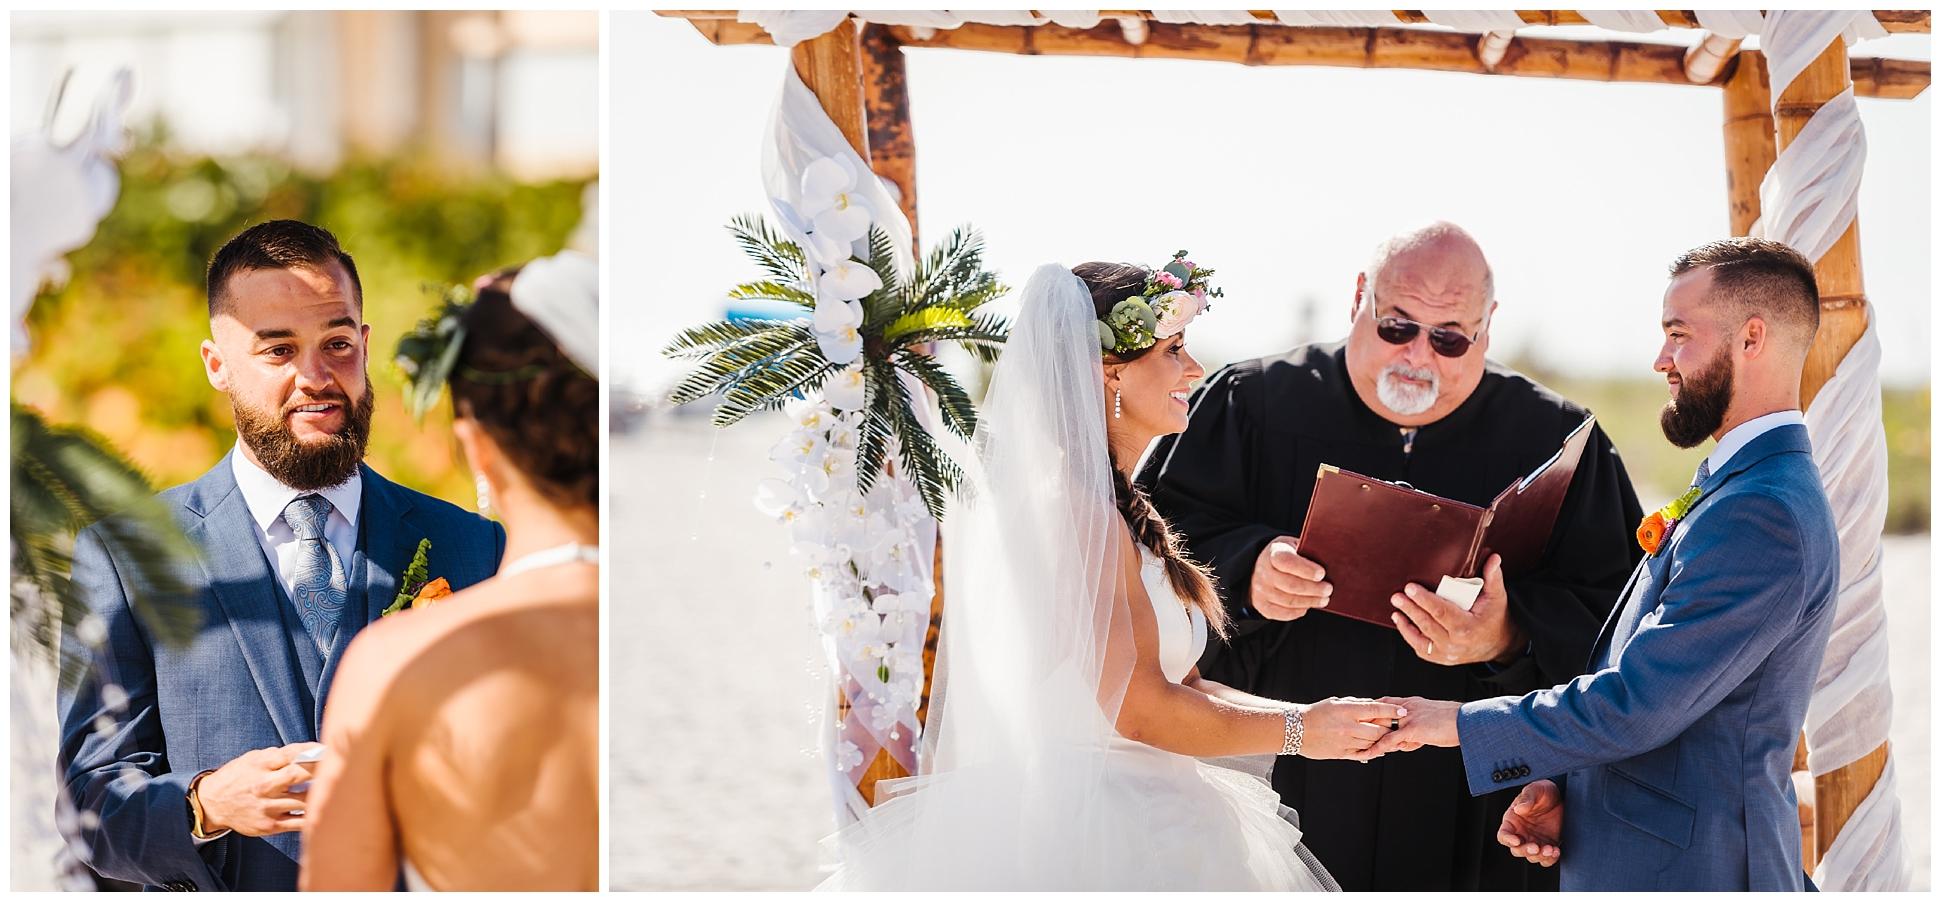 Tampa-wedding-photographer-vera-wang-flower-crown-post-card-inn_0022.jpg